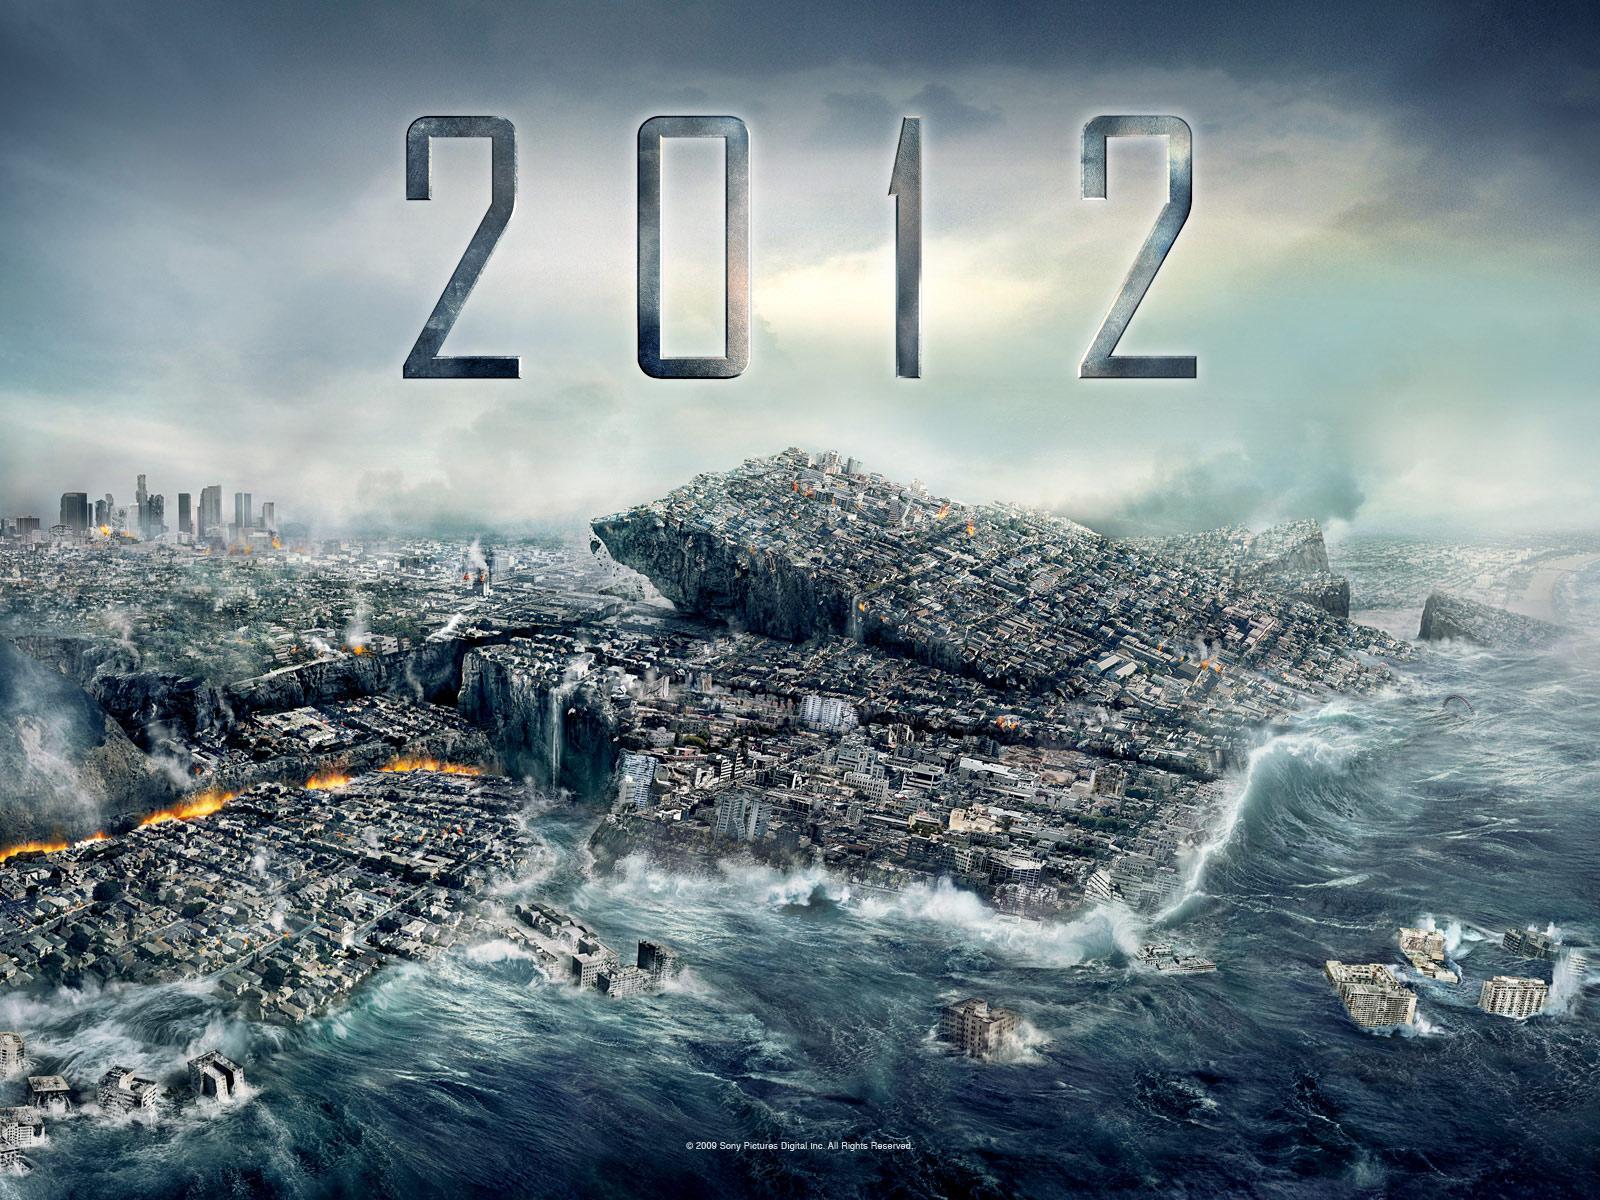 http://2.bp.blogspot.com/_BQQ2F2rxi9E/S6_zyfNDLtI/AAAAAAAAAU8/0MdQnZrRL7k/s1600/2012_Movie,_2009,_John_Cusack,_Amanda_Peet,_Thandie_Newton.jpg